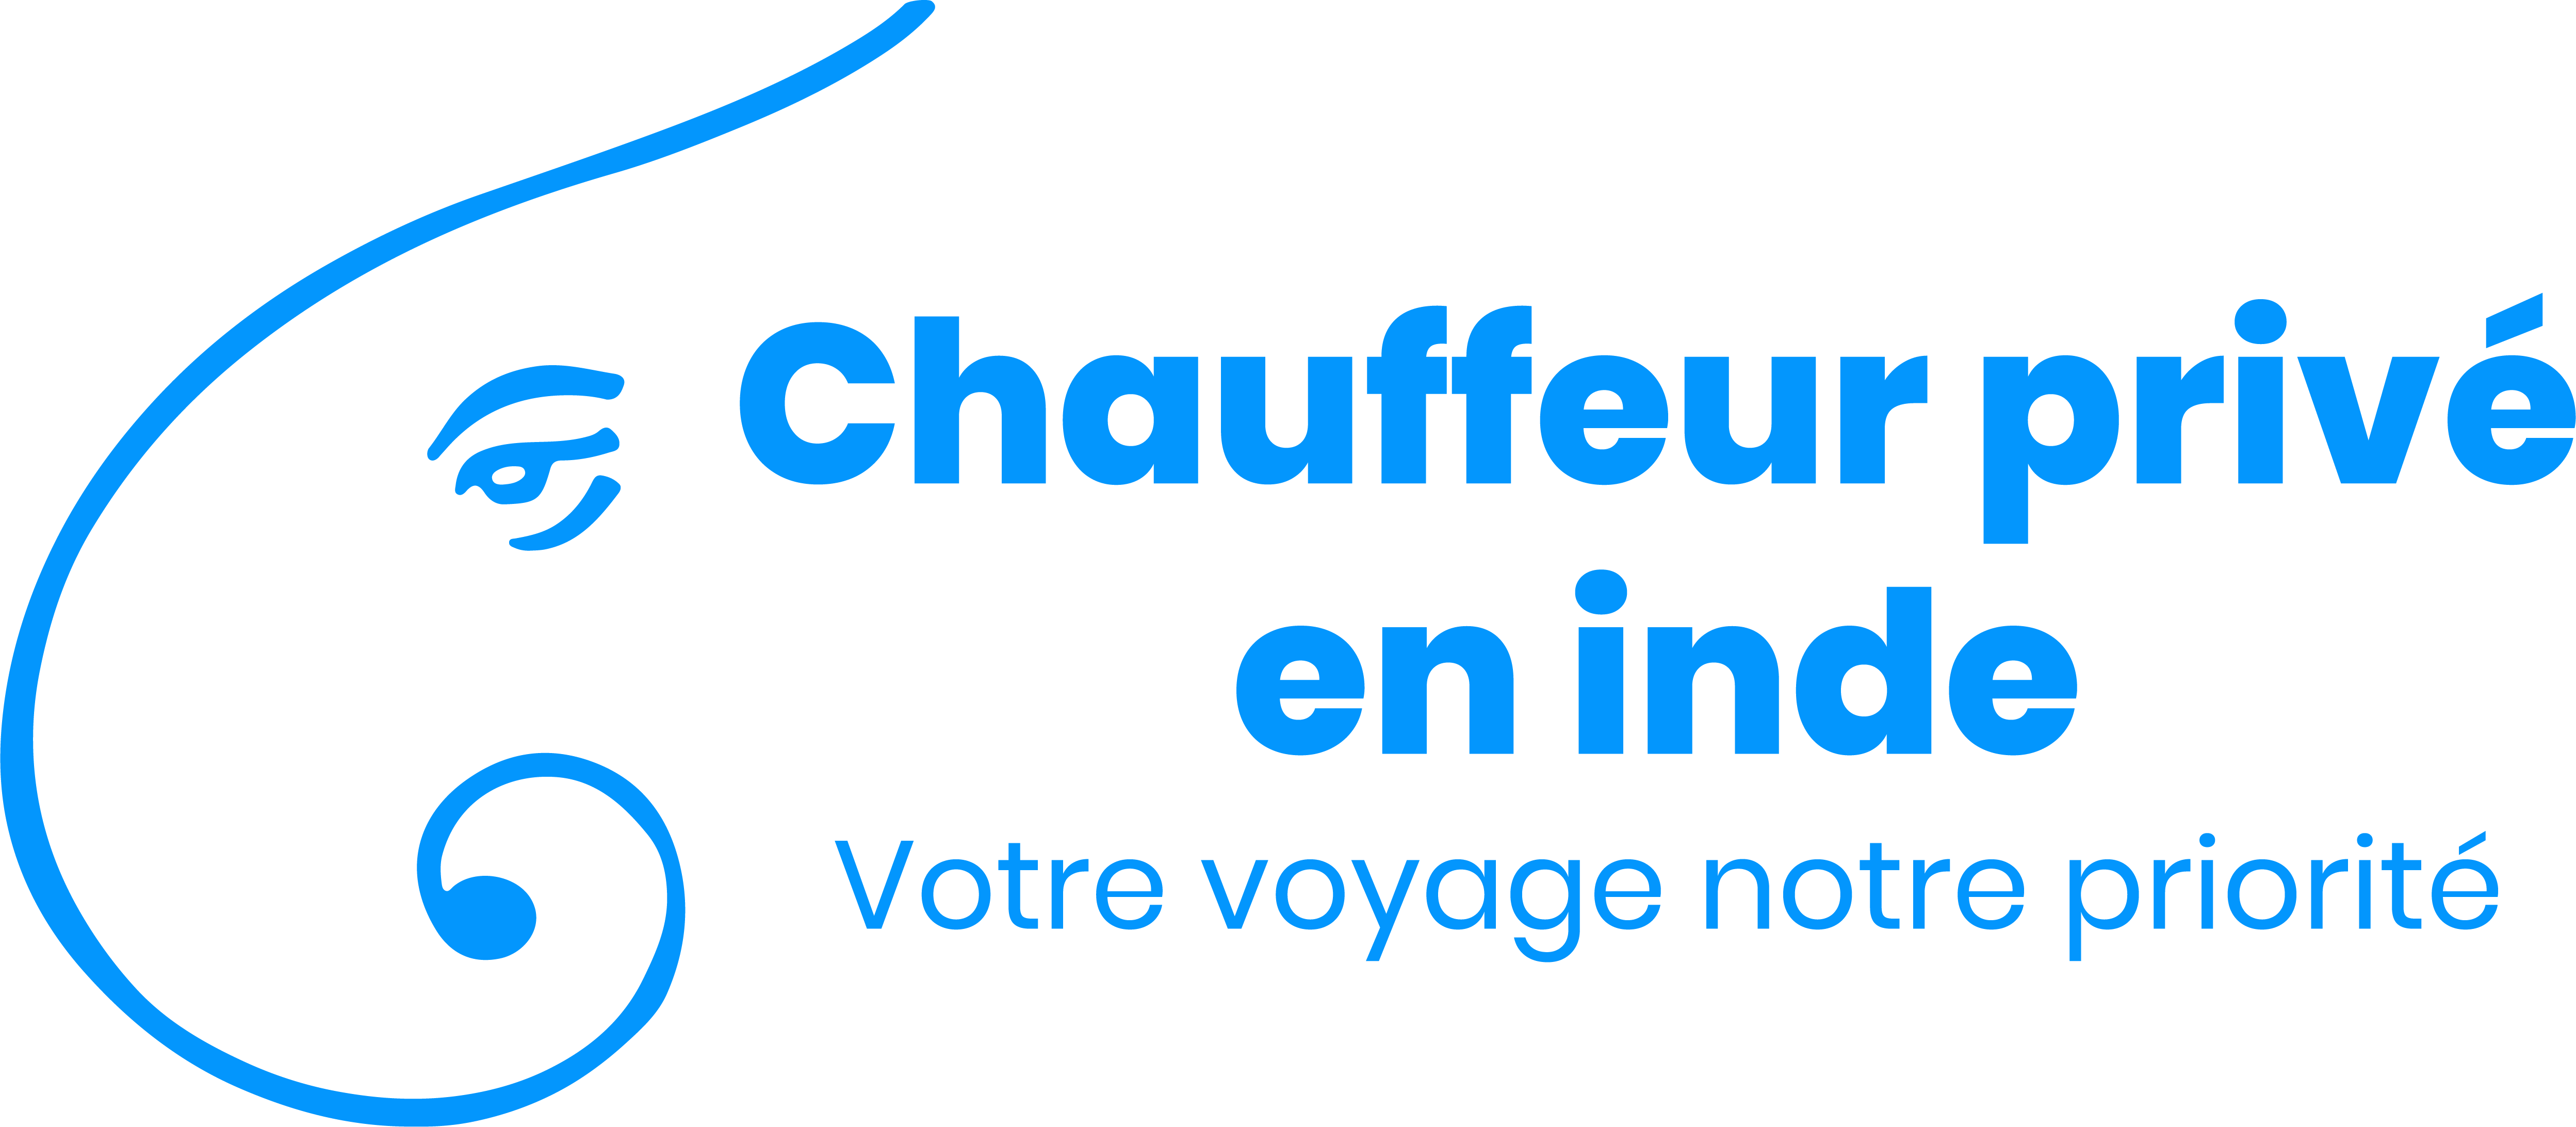 Chauffeurpriveeninde.com